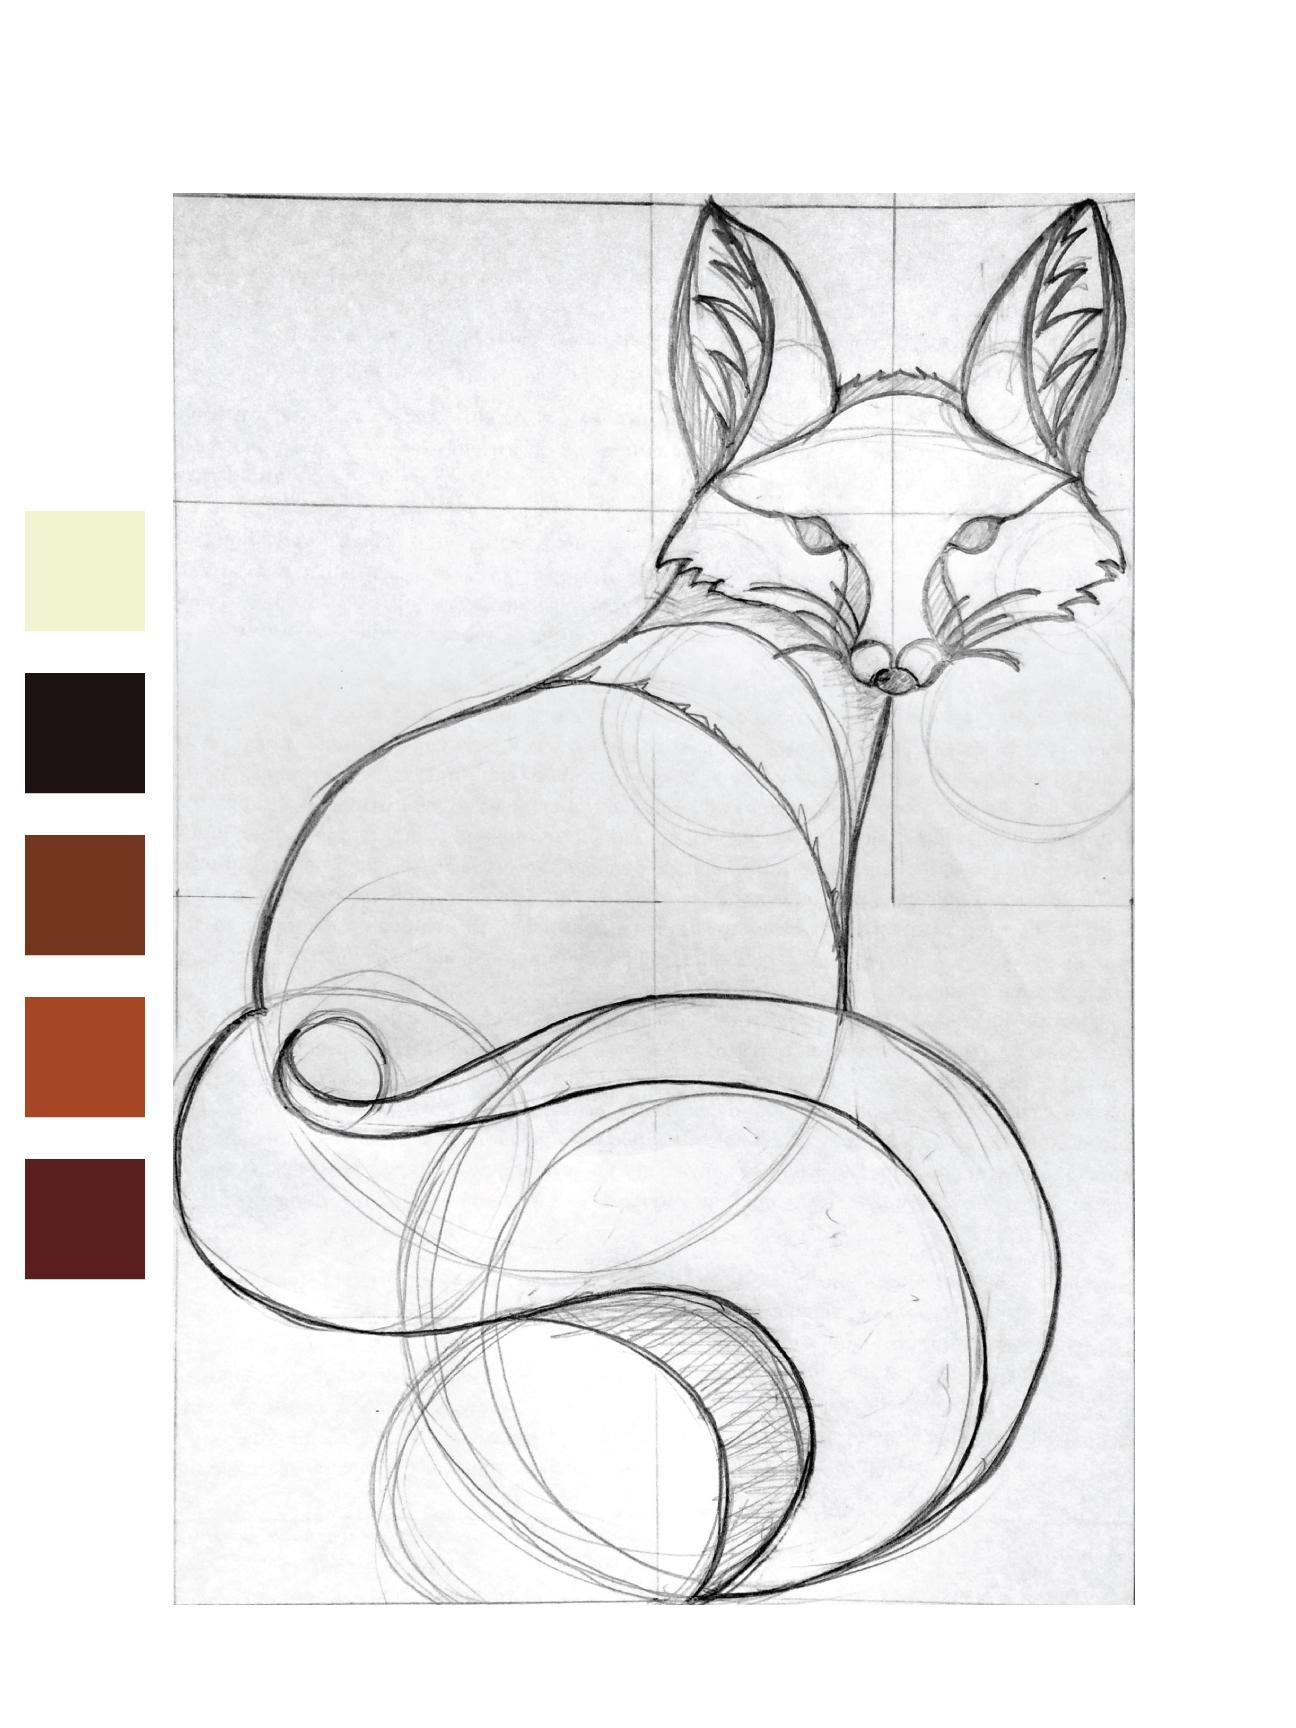 Light Fox - image 2 - student project